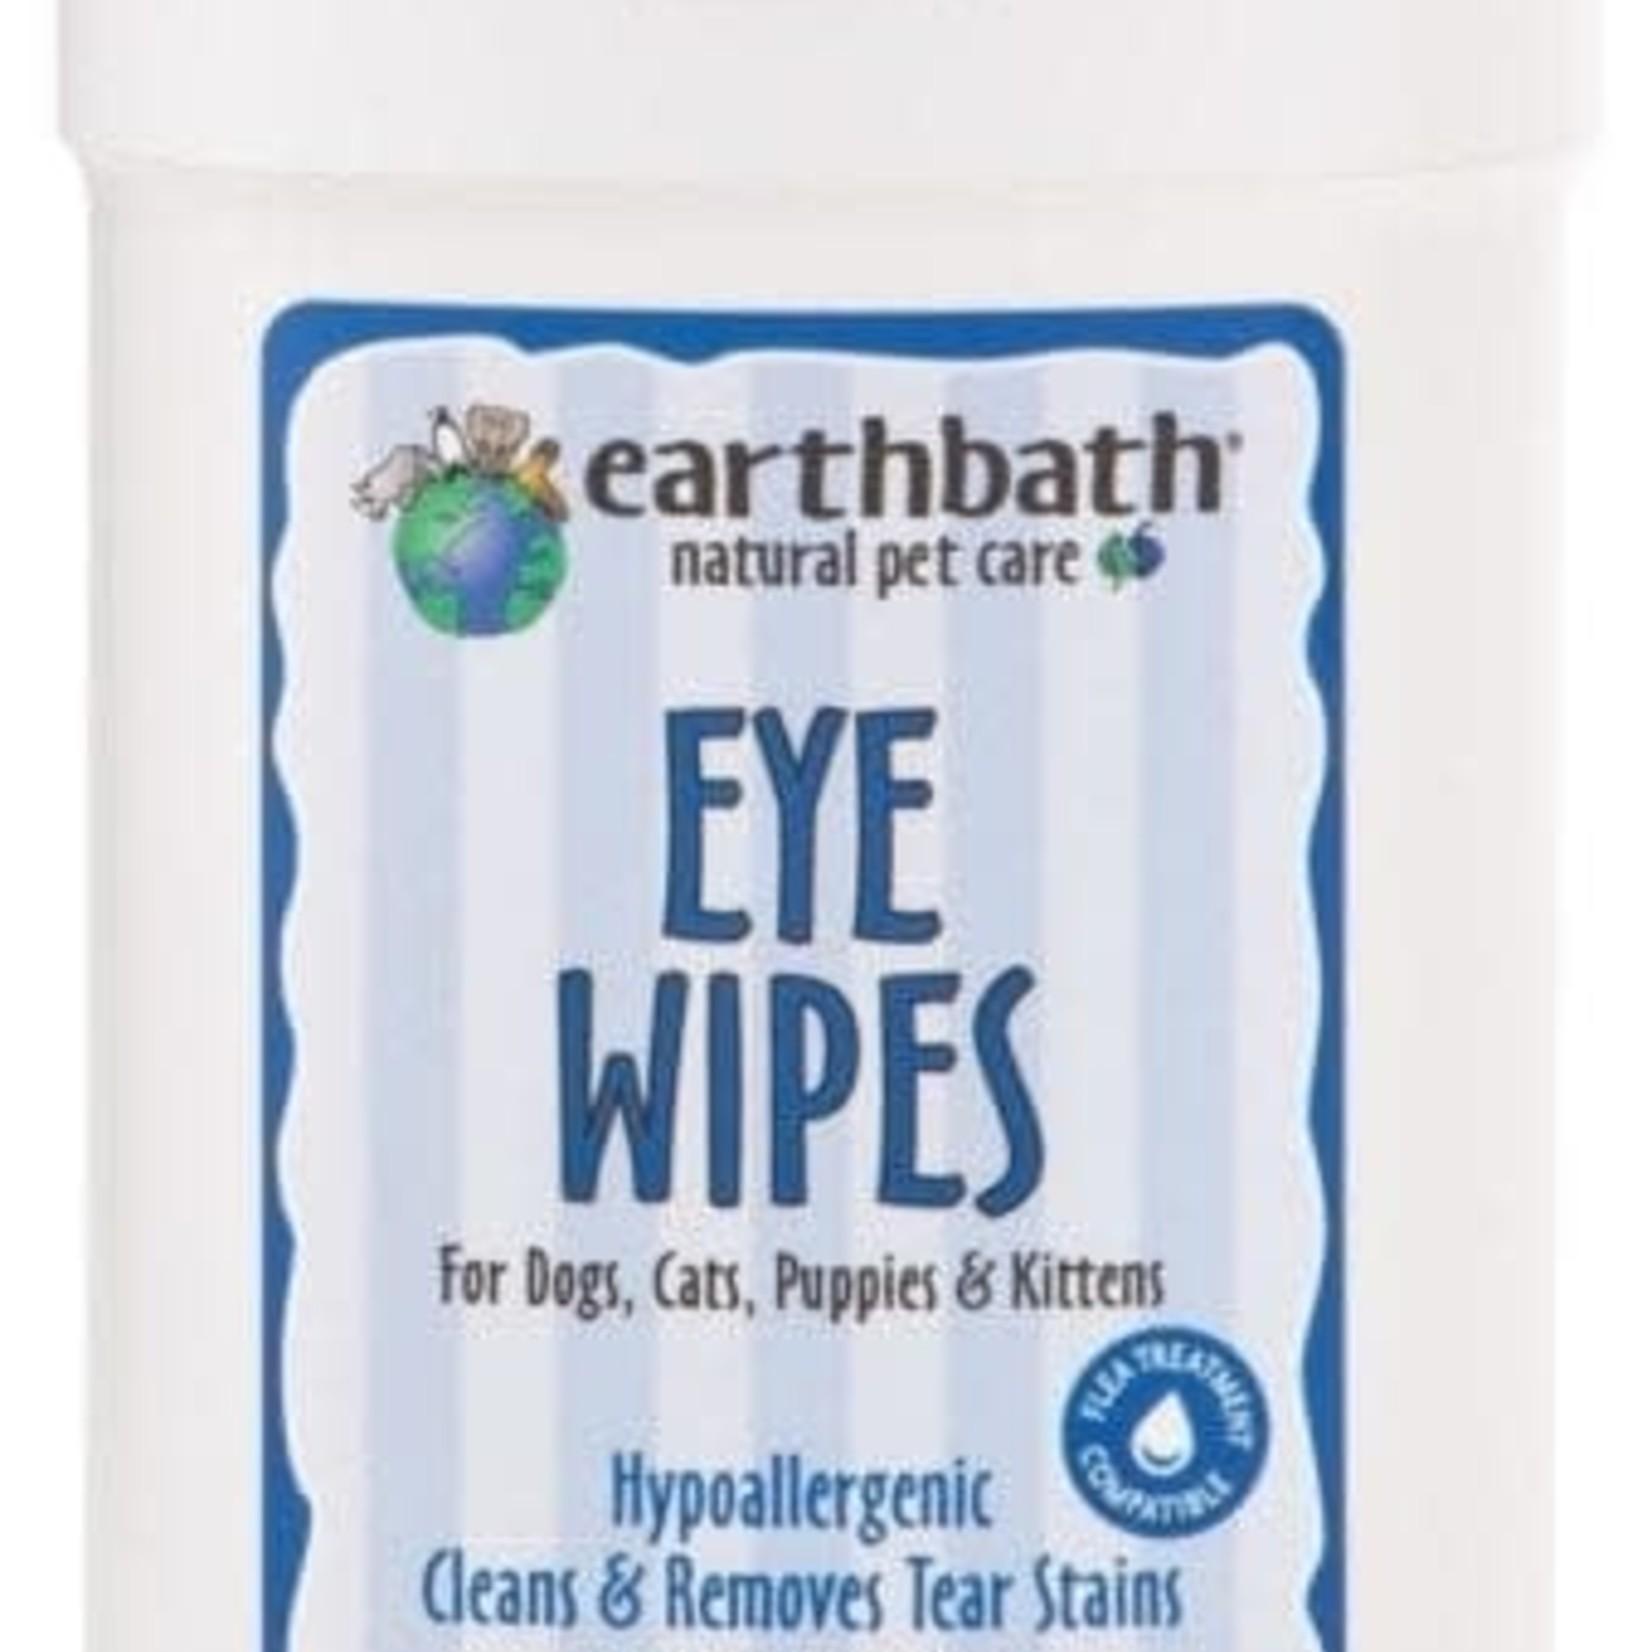 Earth Bath / Shea Pet Earth Bath Dog & Cat Eye Wipes 25 Count